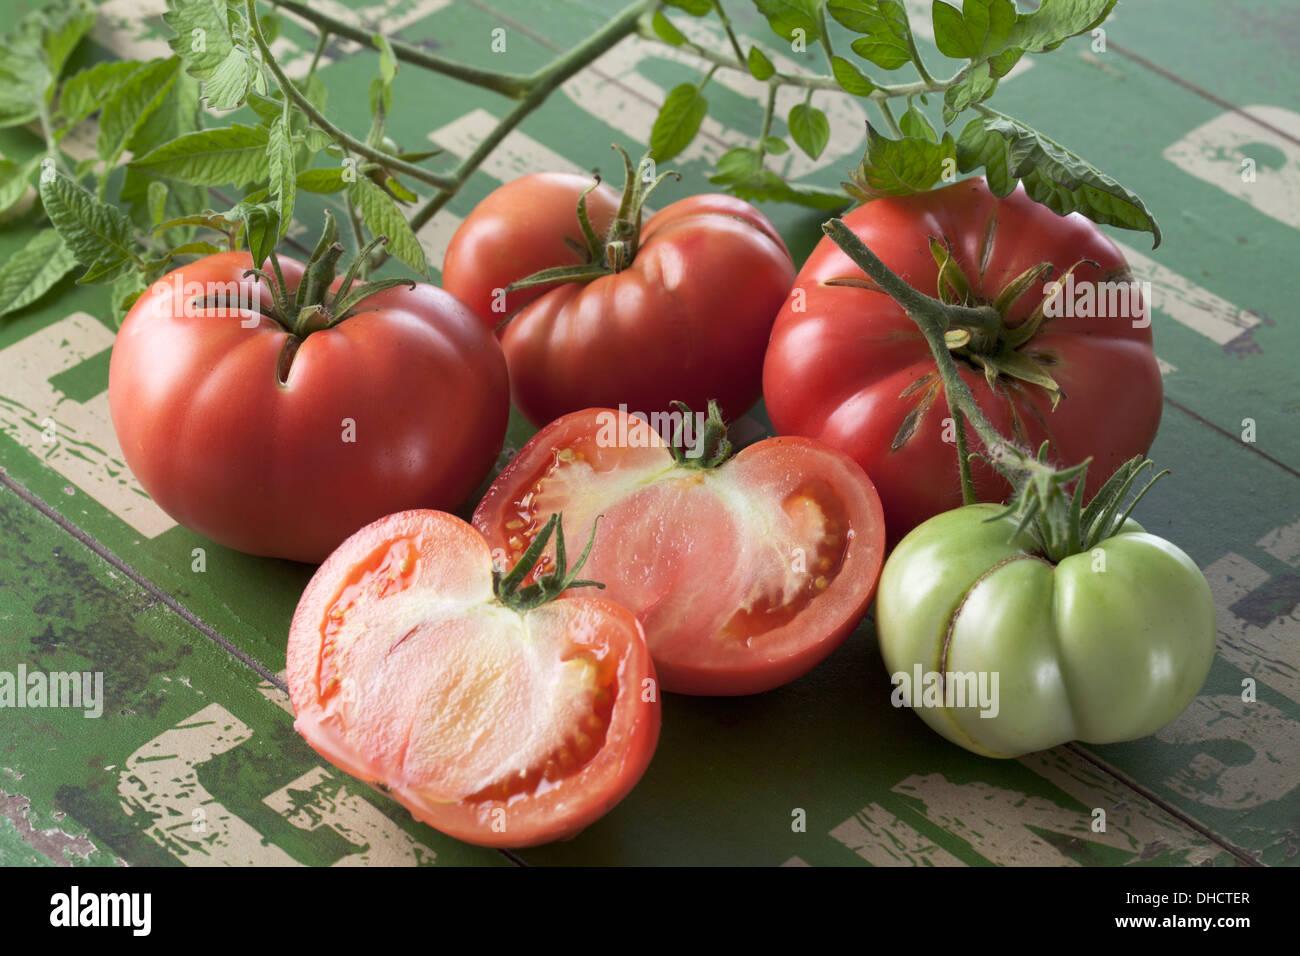 Whole and sliced Silesian raspberry tomatoes (Solanum lycopersicum), studio shot Stock Photo